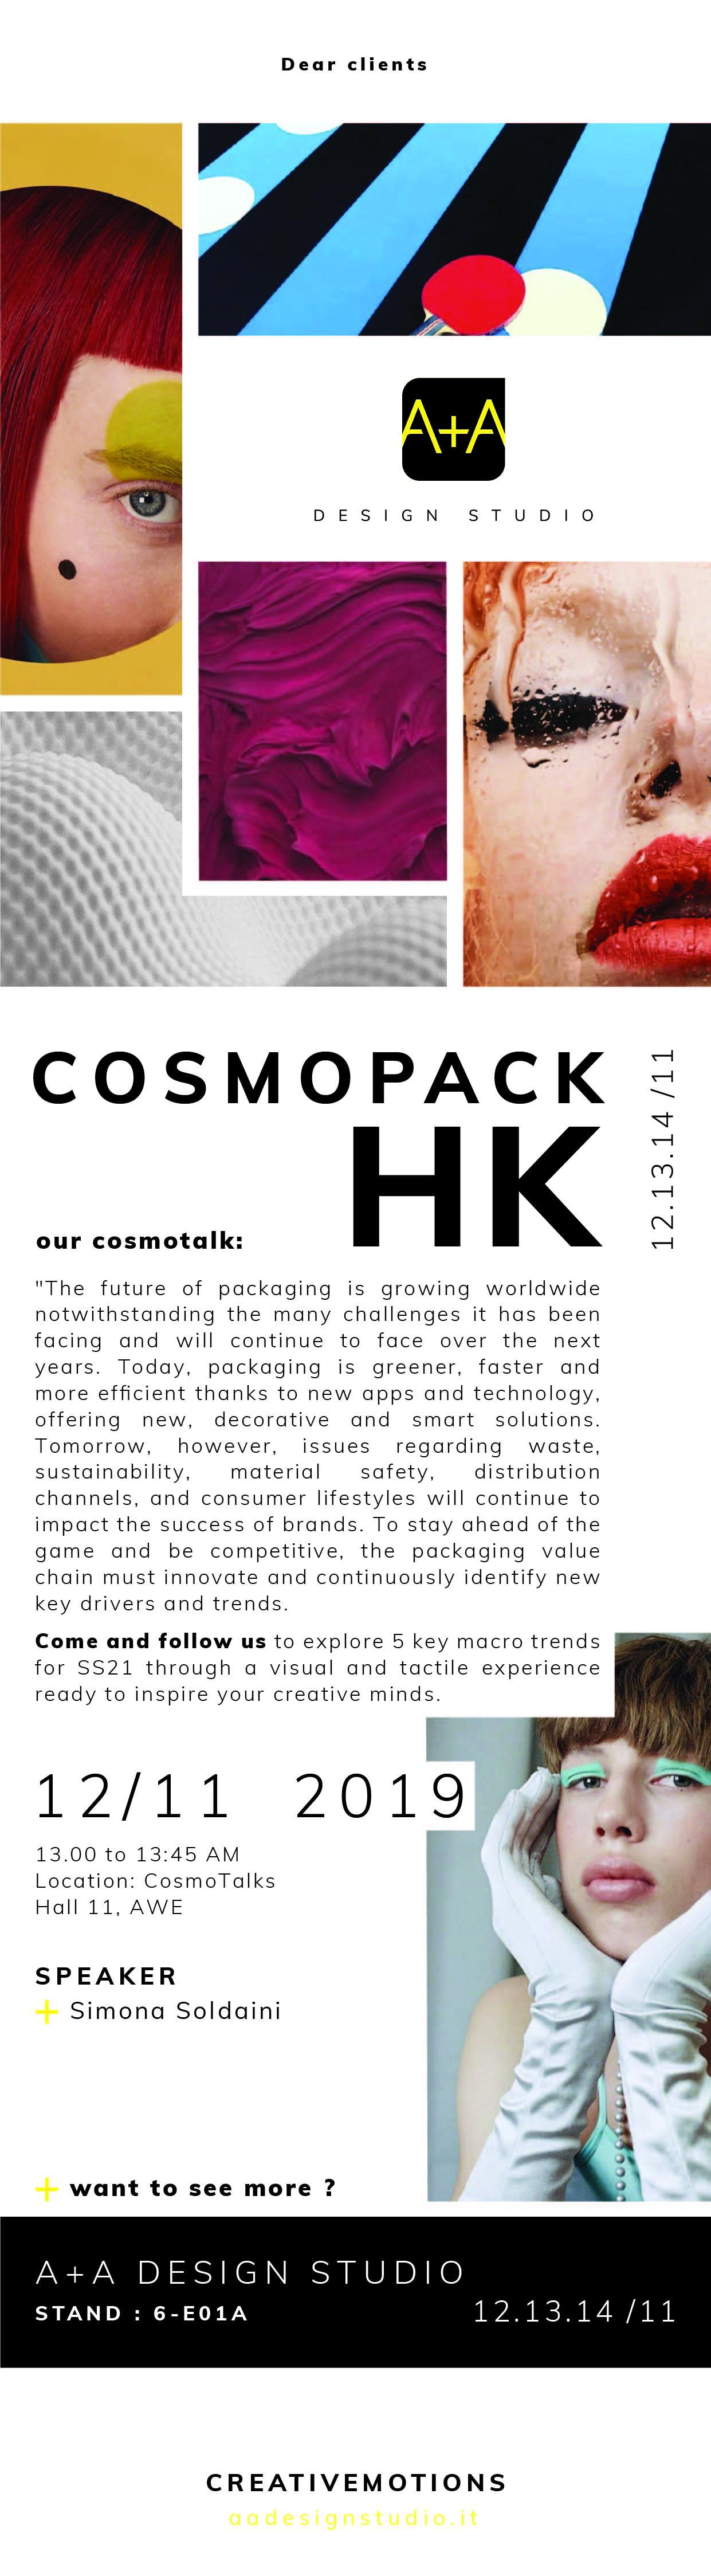 invito COSMOPACK HK-01